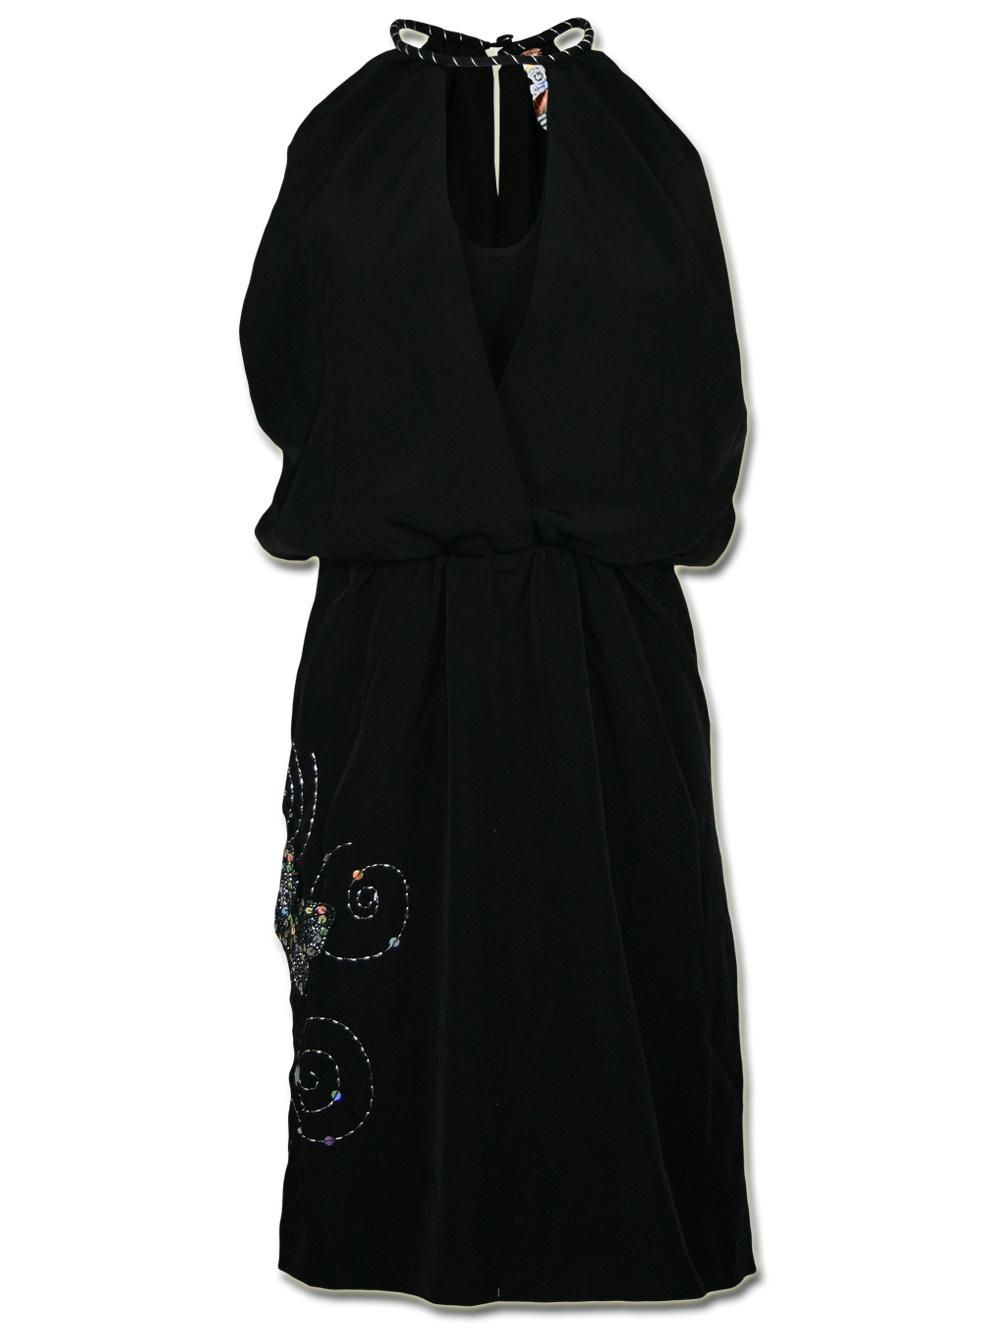 Desigual Damen Kleid Lilah Desigual 5230 Kleider Gunstig Online